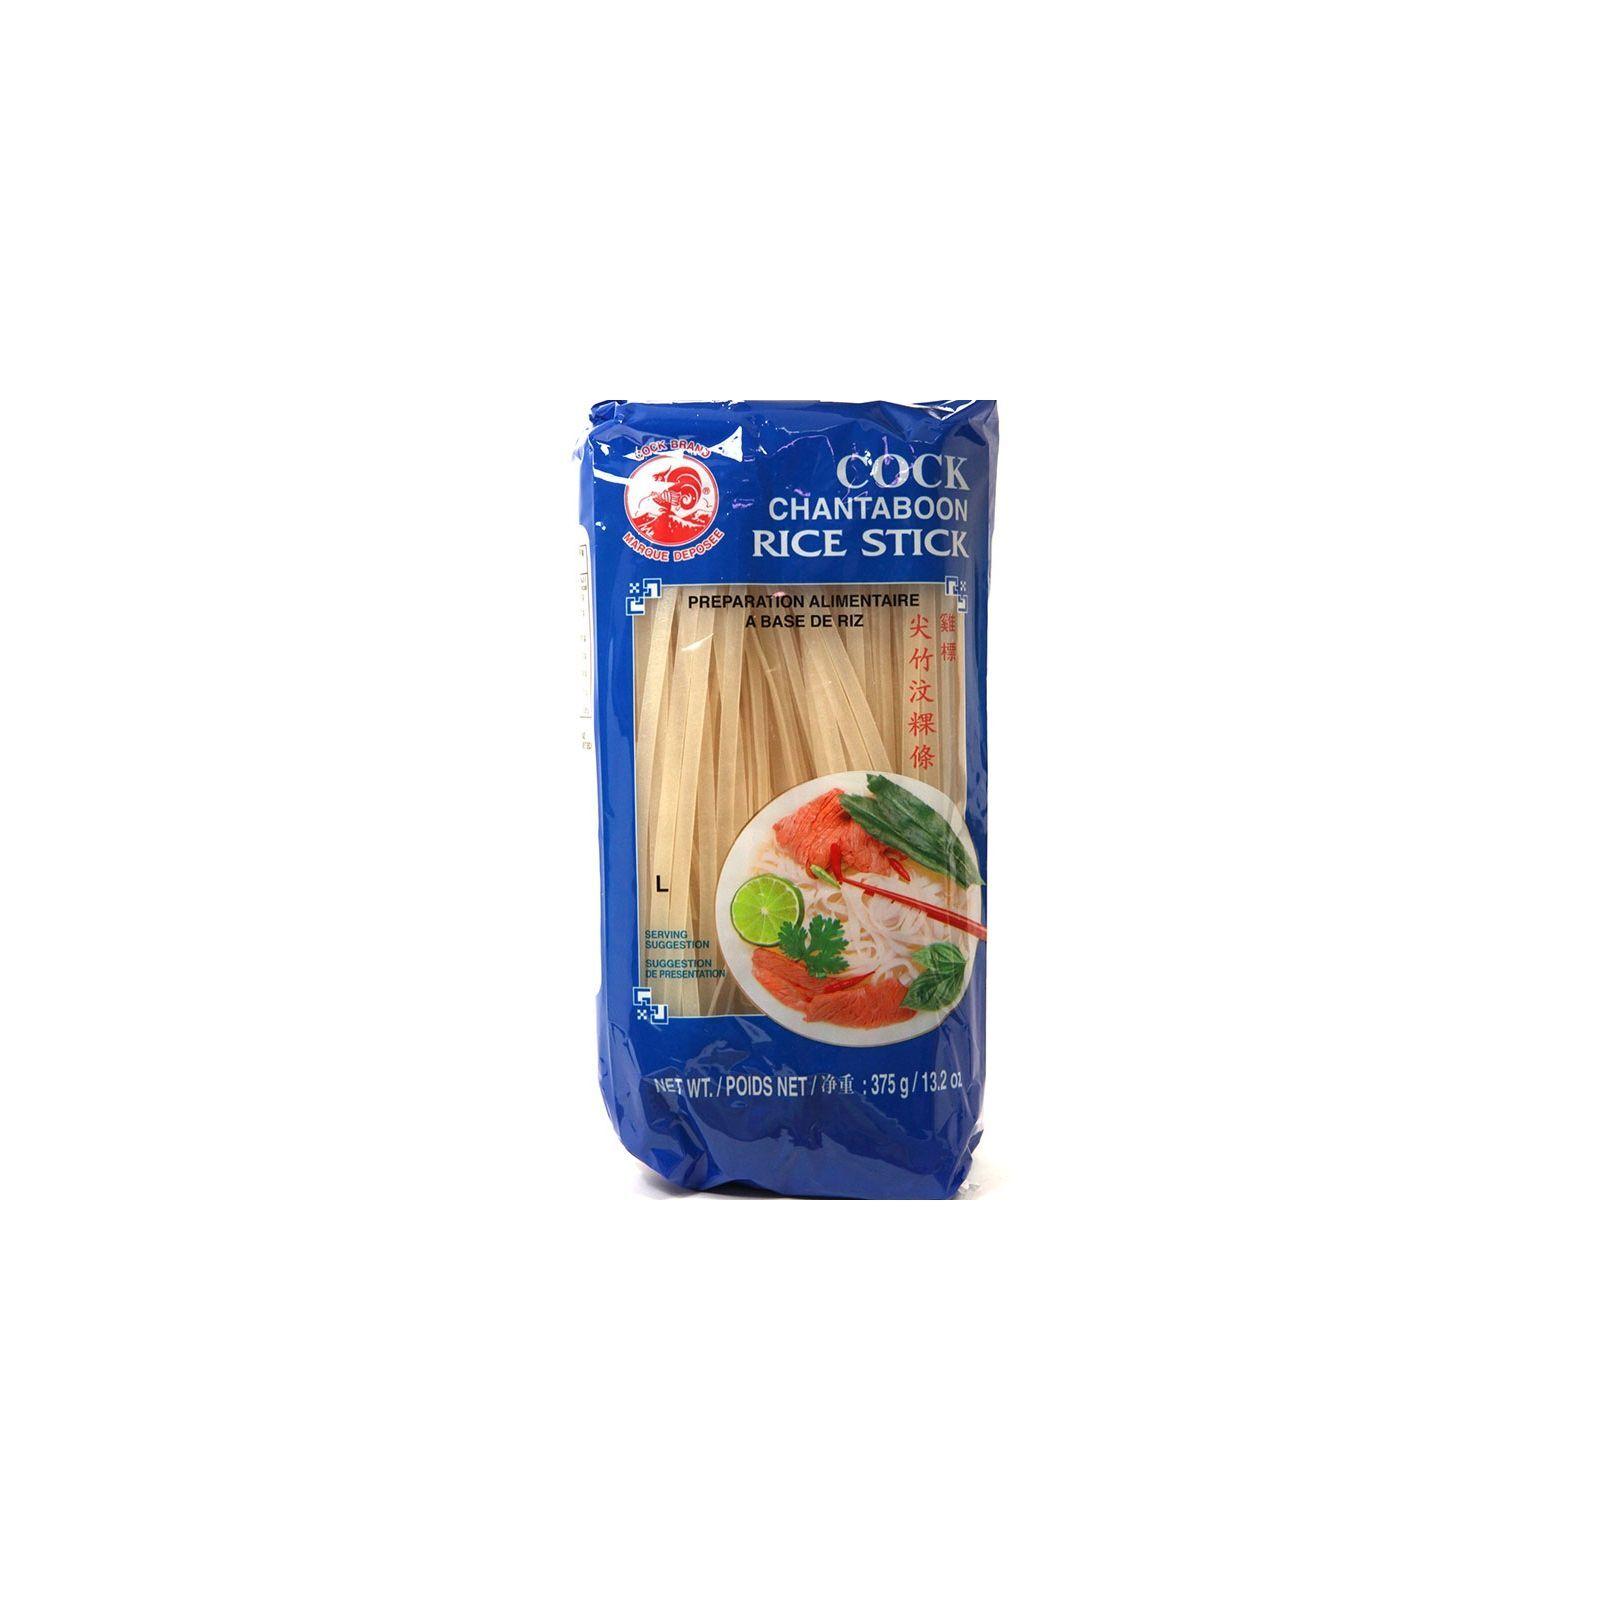 Asia Marché Pâte de riz Chantaboon 375g 3 mm